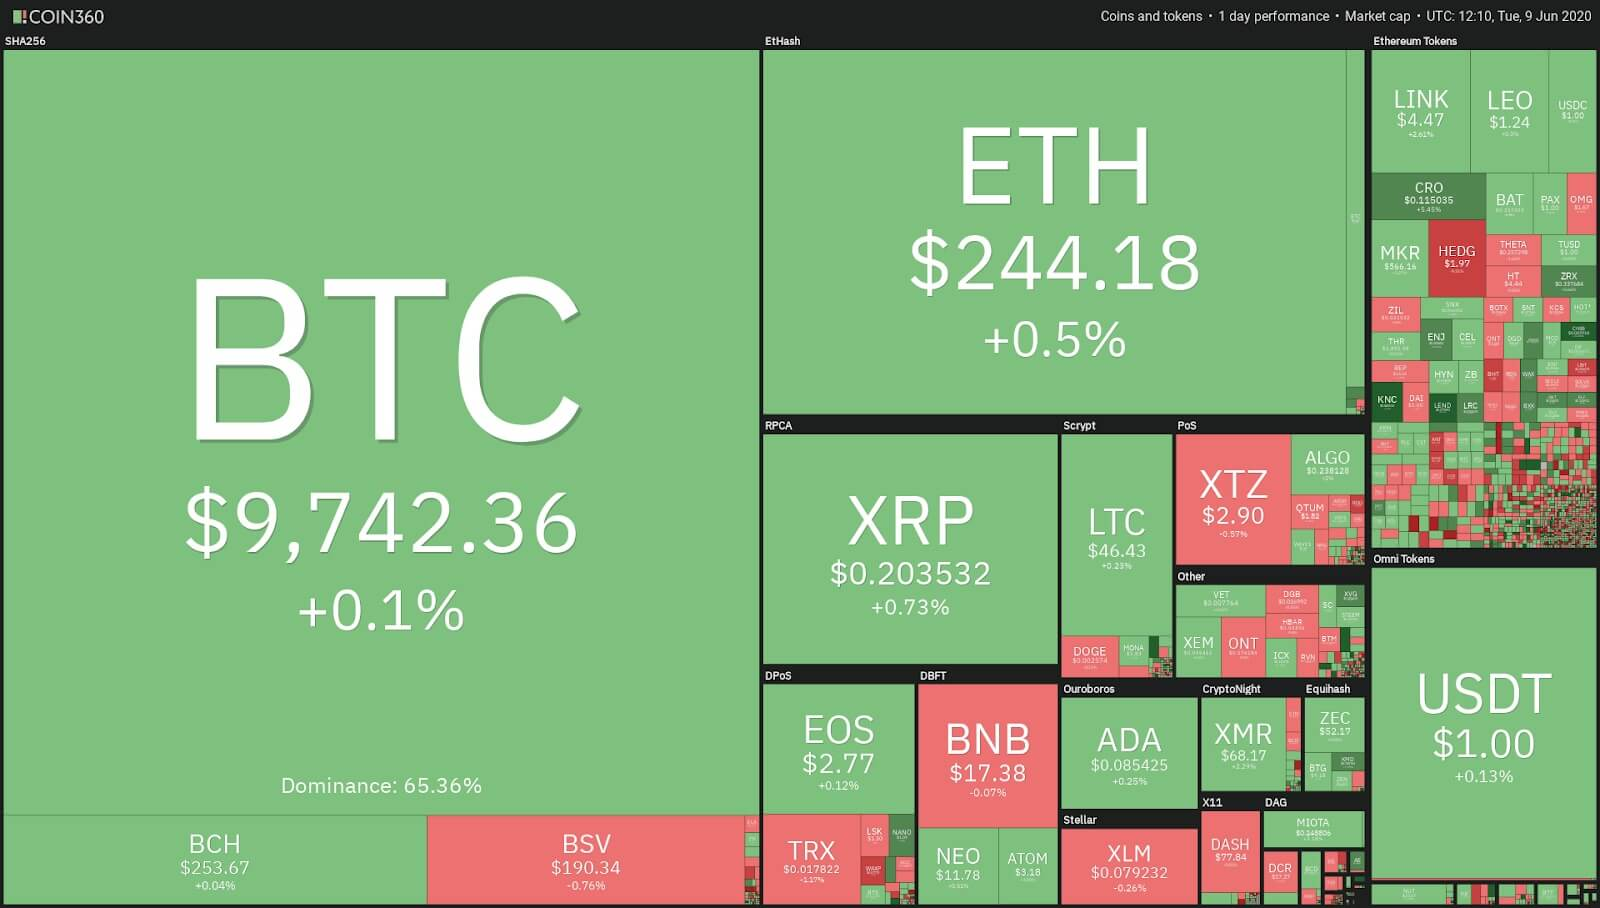 Zilliqa (ZIL) Yüzde 950 Artarak Bitcoin'i Geçti! 1 -